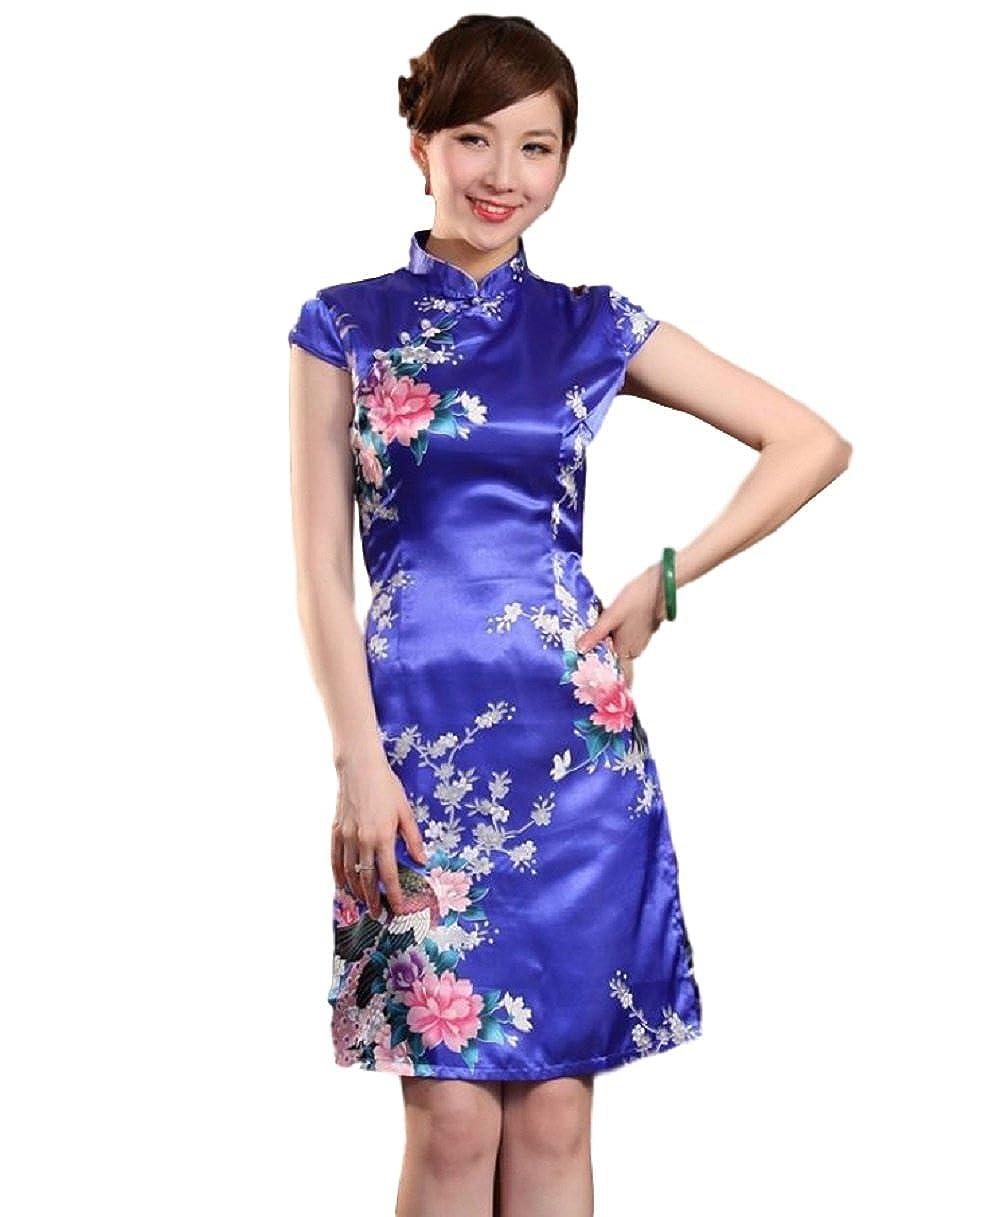 47b8d4cc3437 Top7: Women's Mini Chinese Dress Cheongsam [Red/Blue/Pink] Mandarin Gown  Qipao China Dress